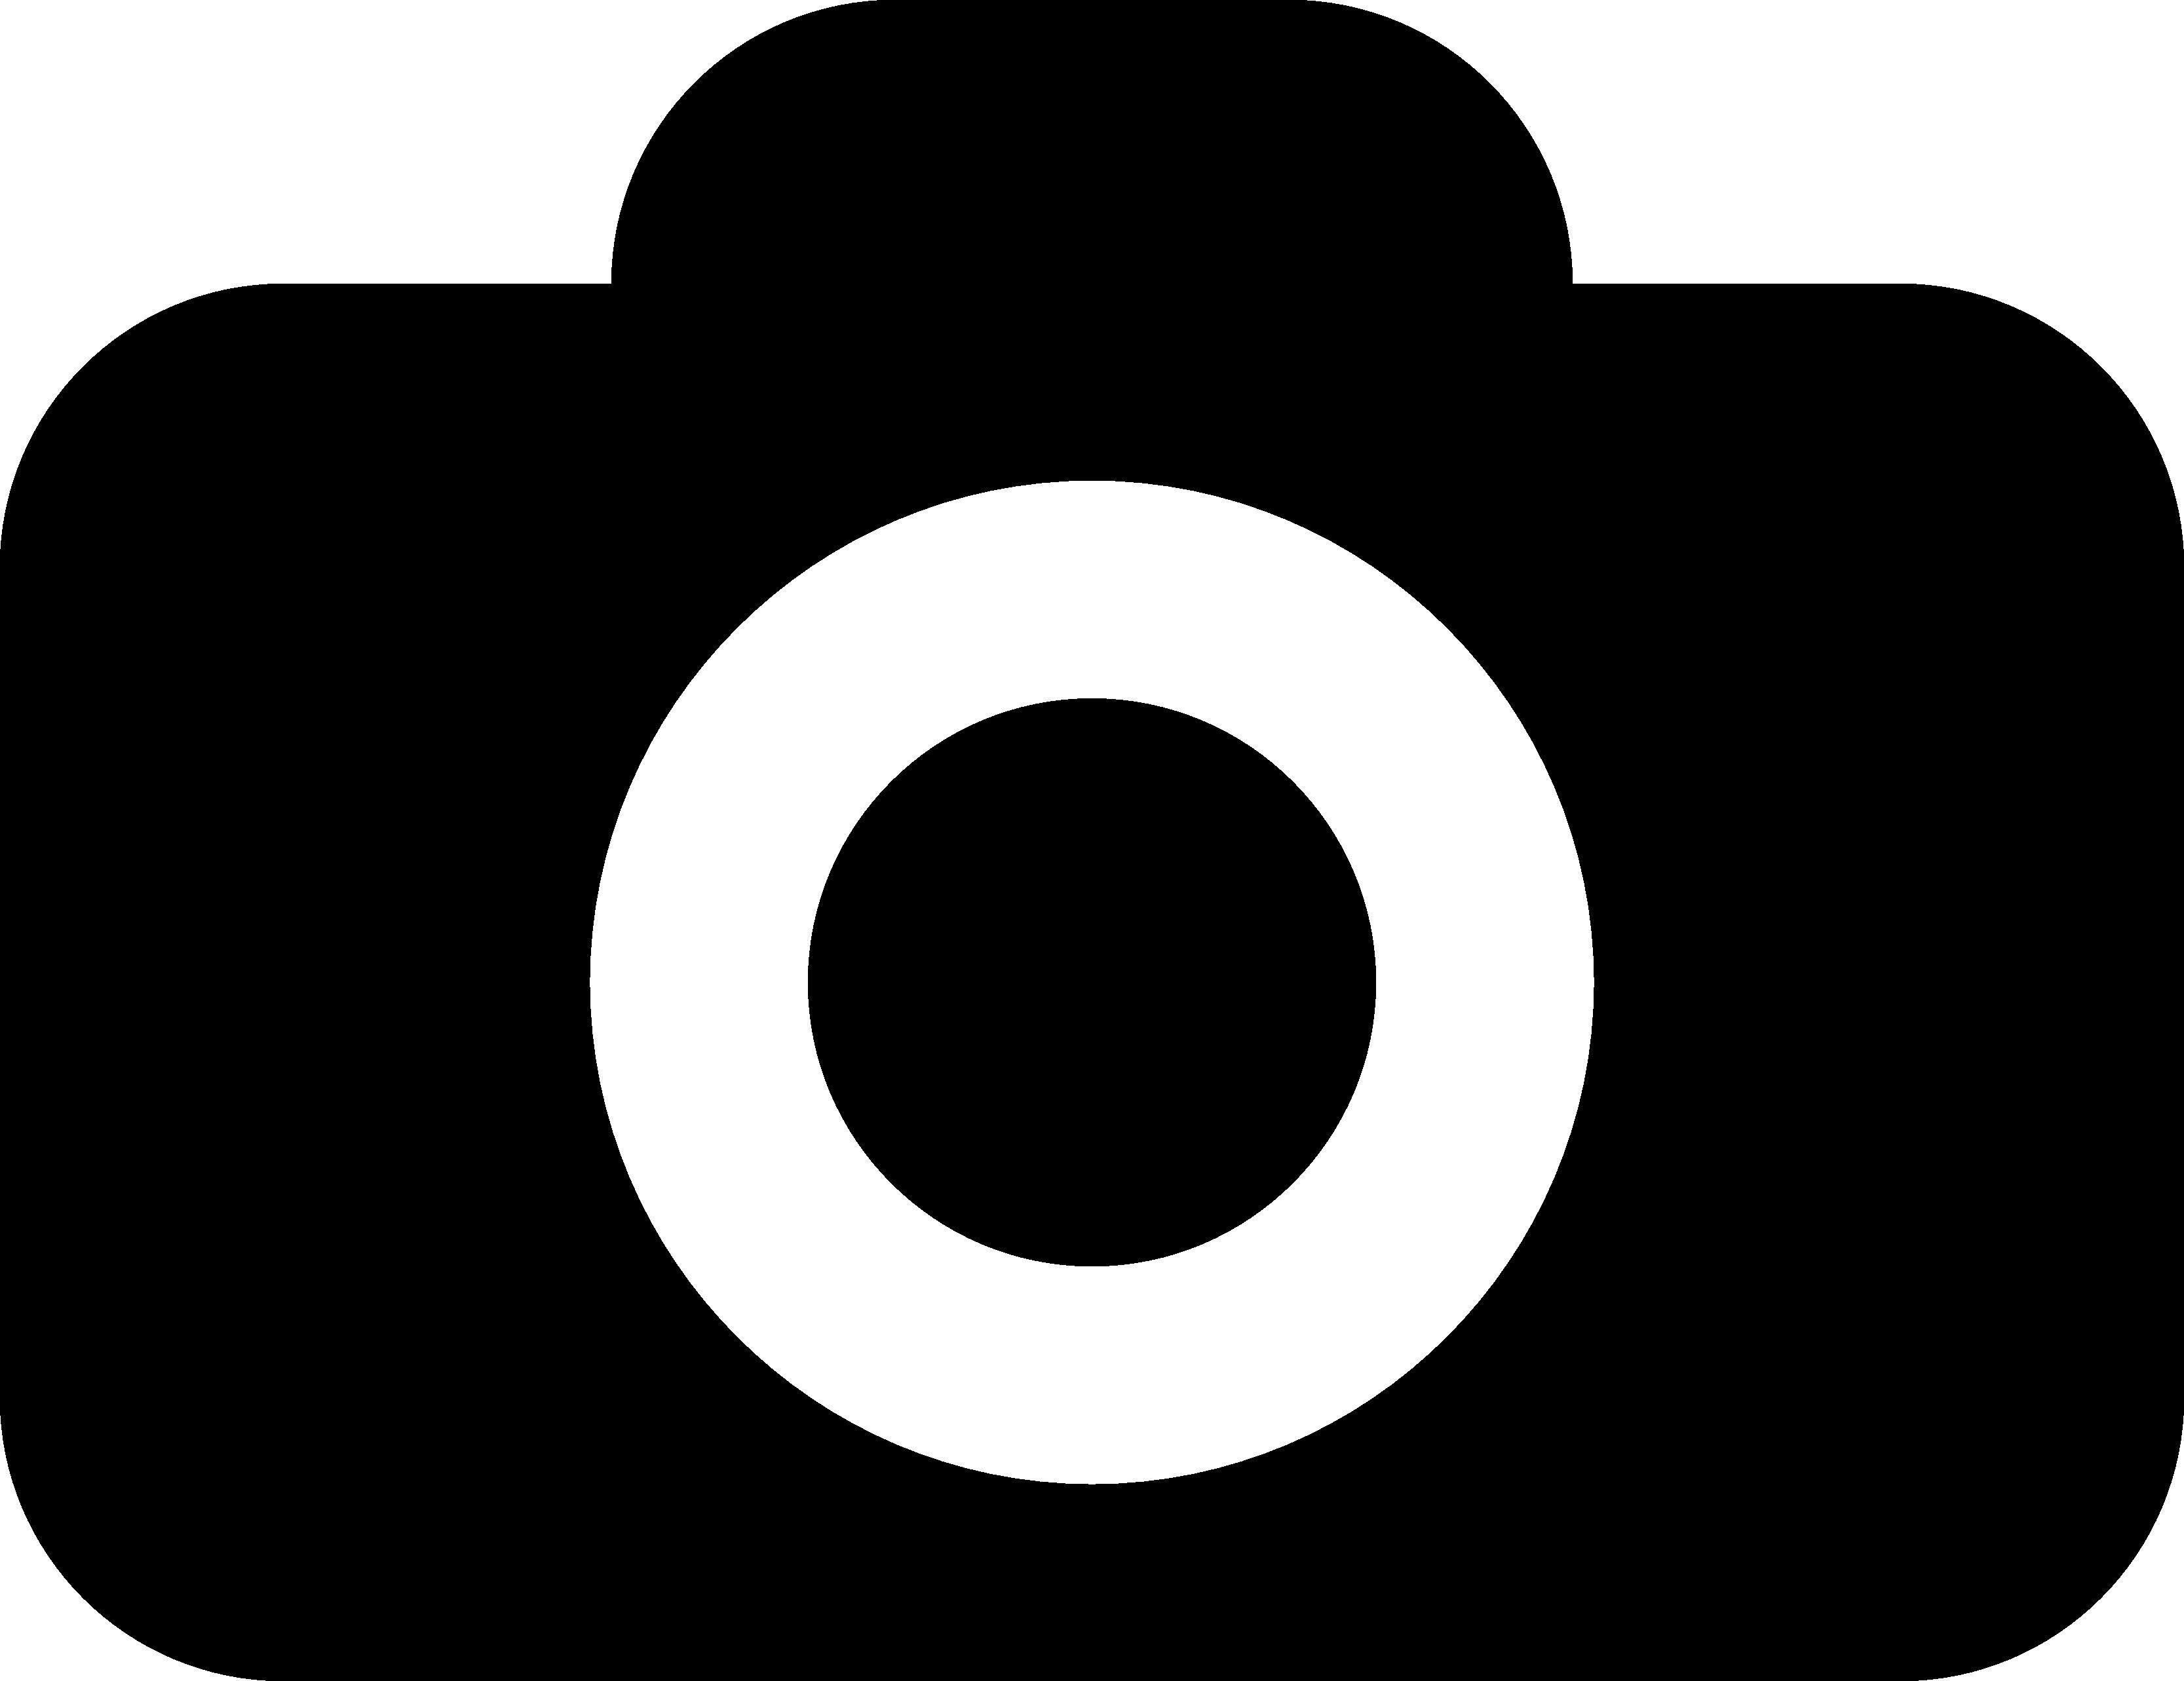 Photography Symbols Png.